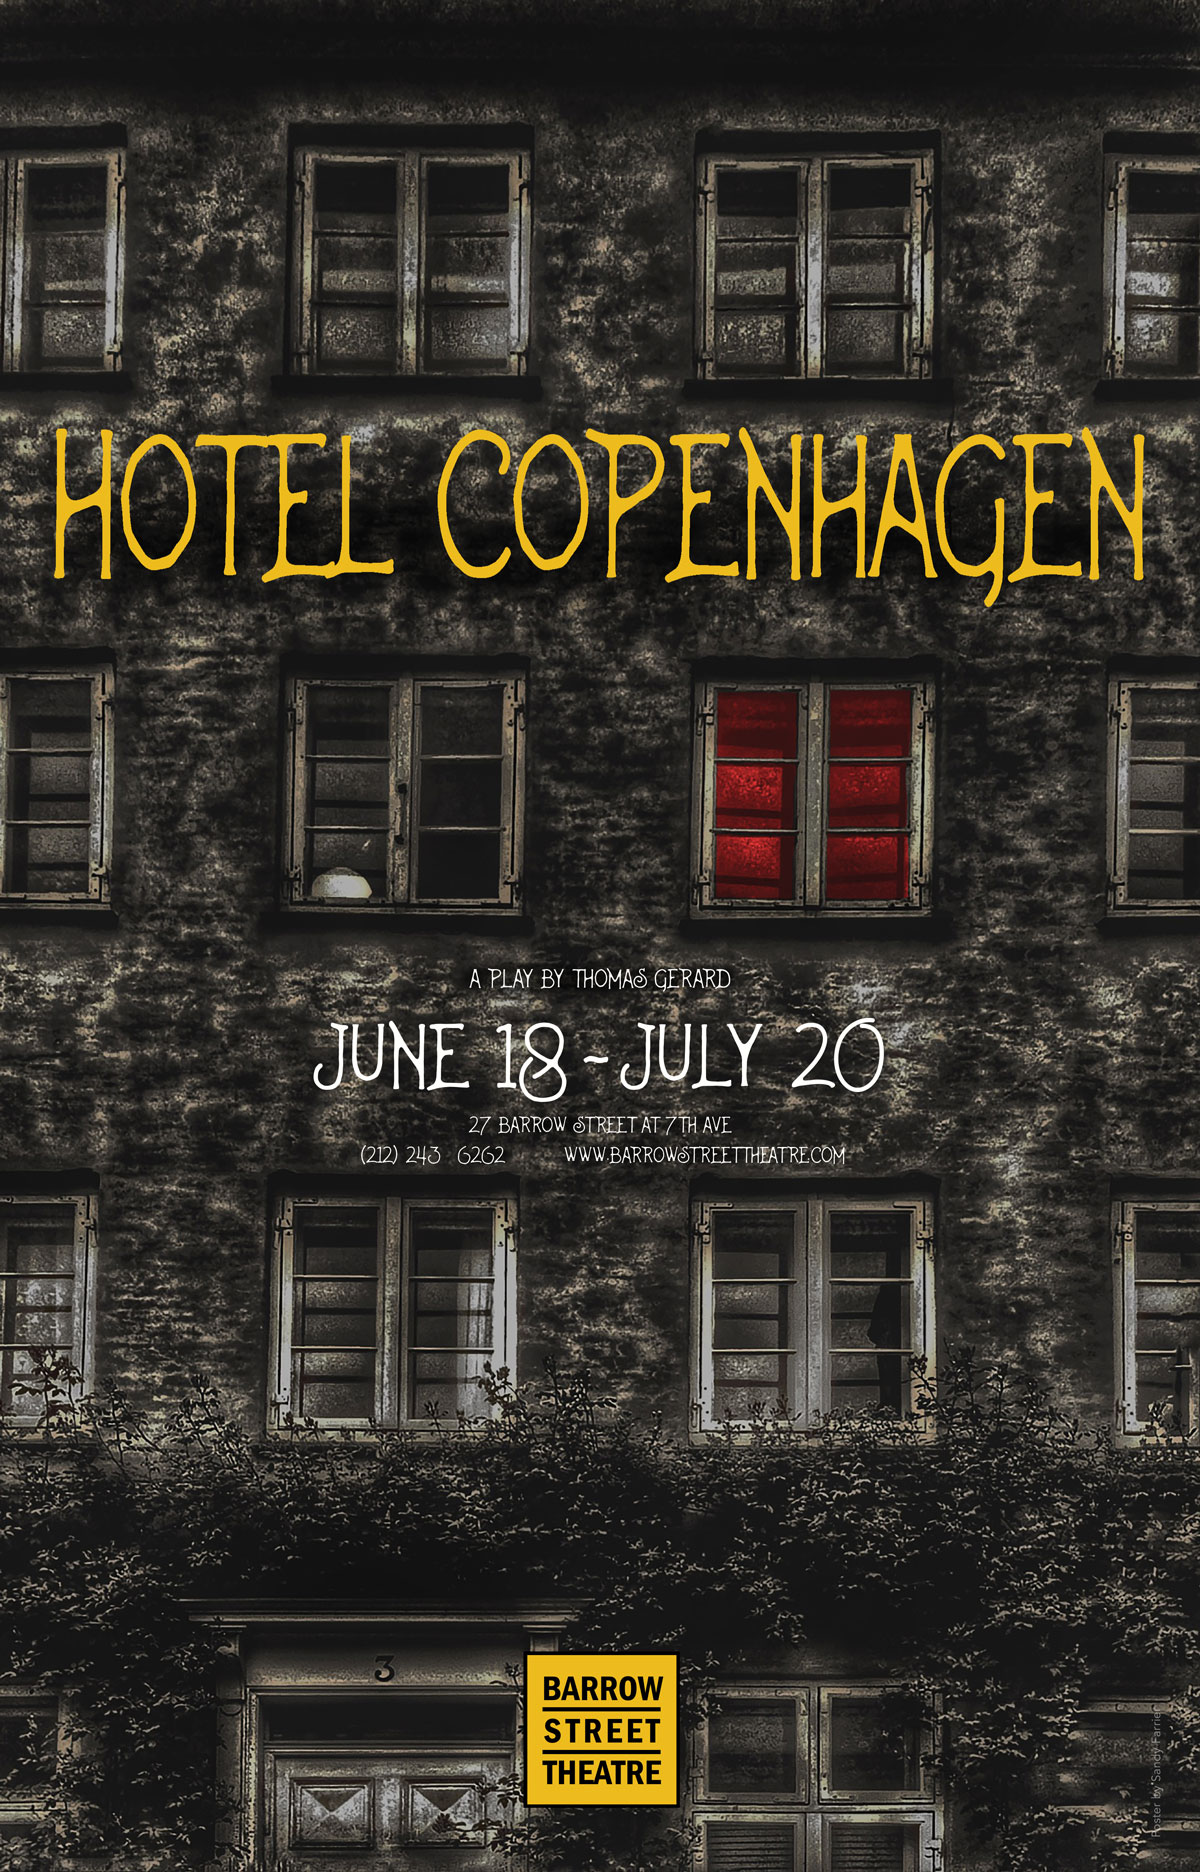 HOTEL-COPENHAGEN.jpg